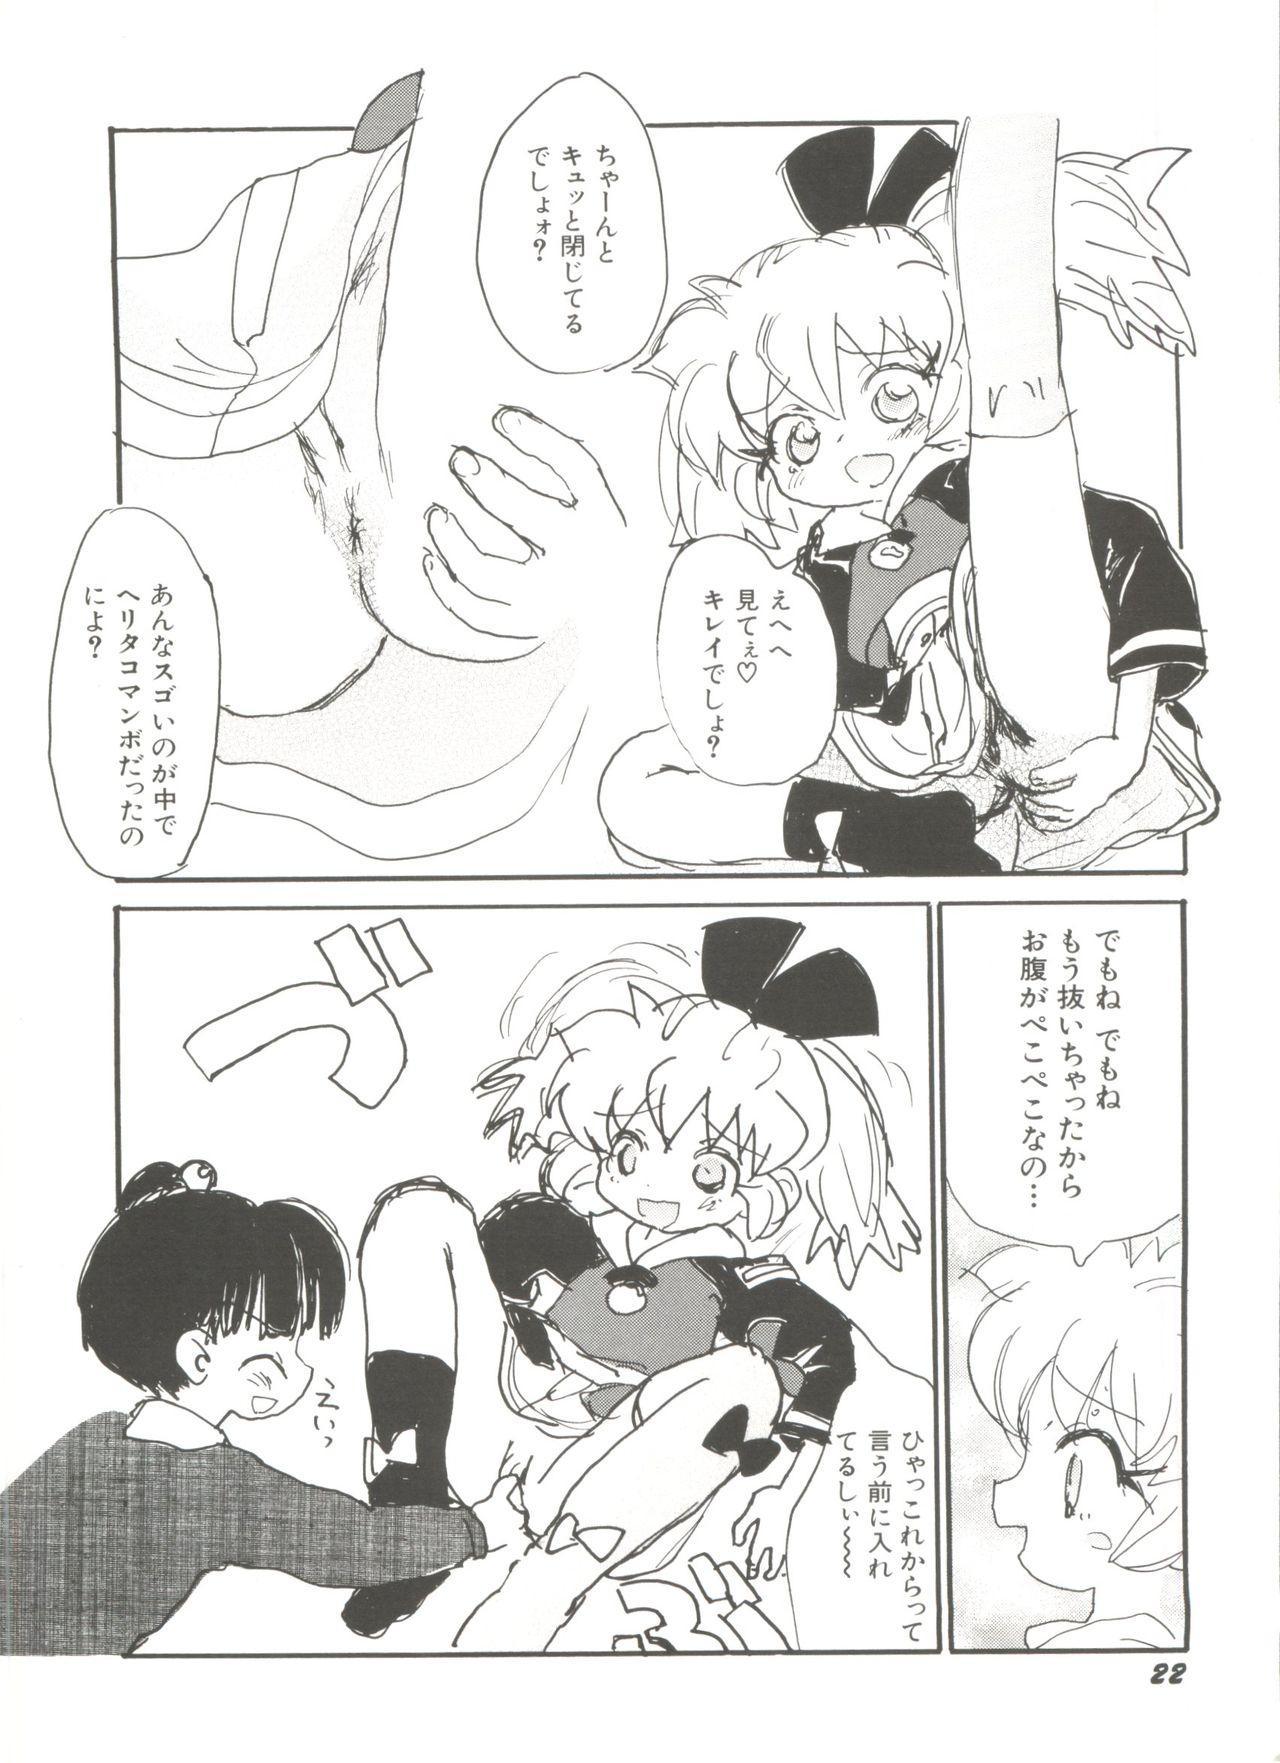 [Anthology] Denei Tamatebako 8 - Utakata no Tenshi-tachi II (Various) 23